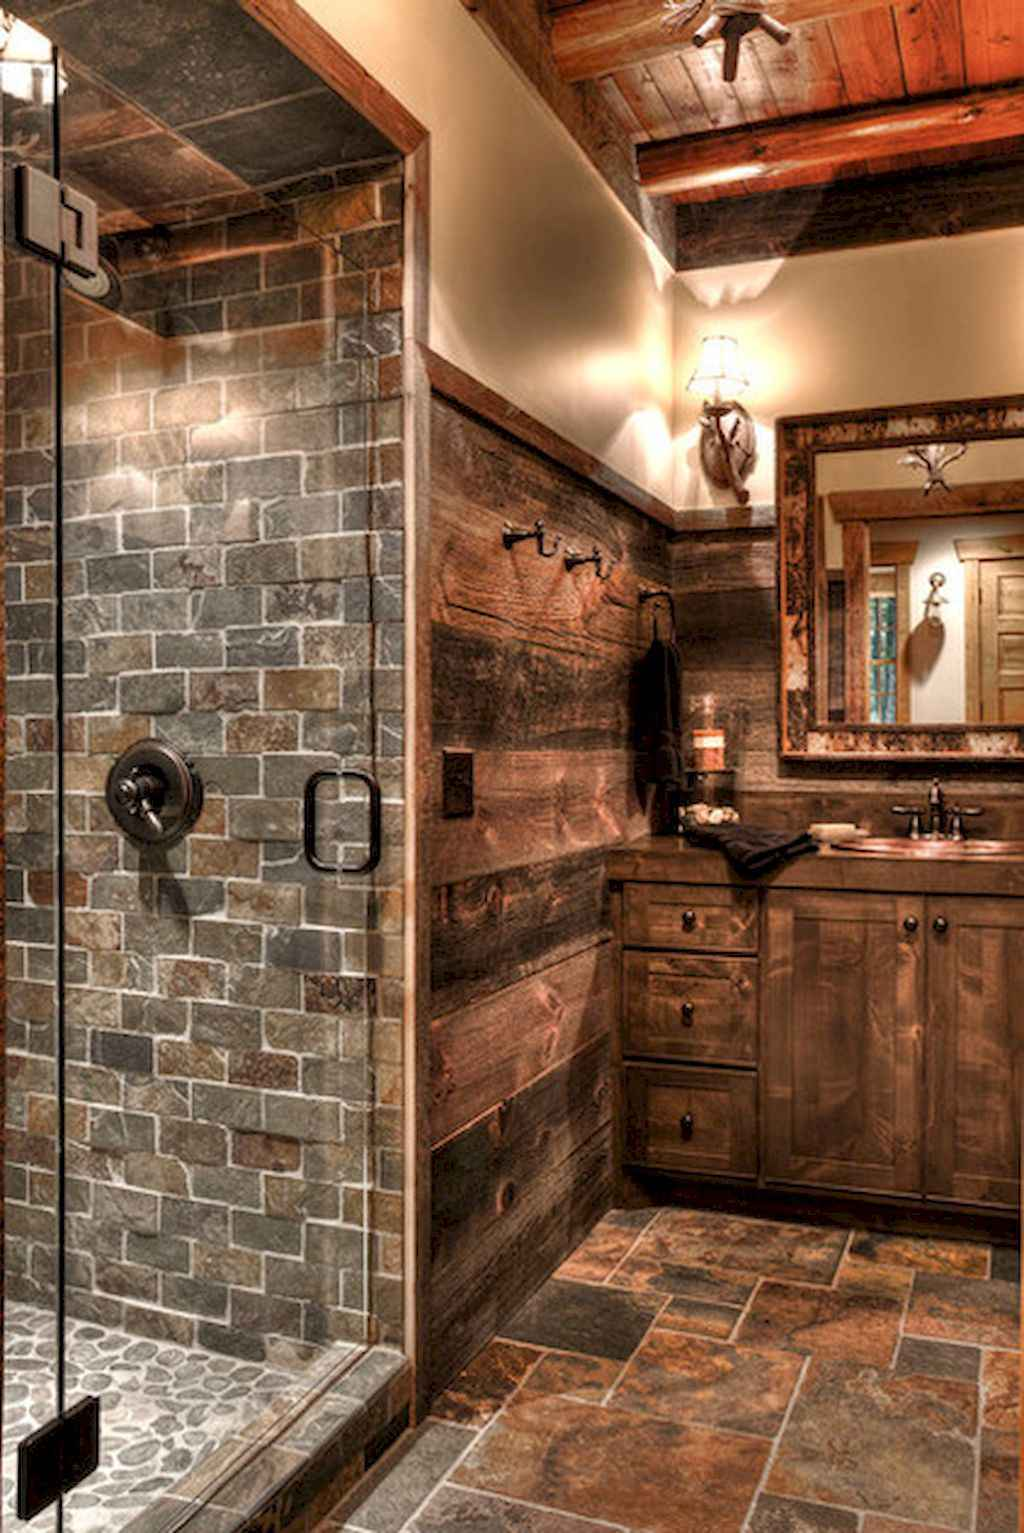 Inspiring rustic bathroom decor ideas (23)